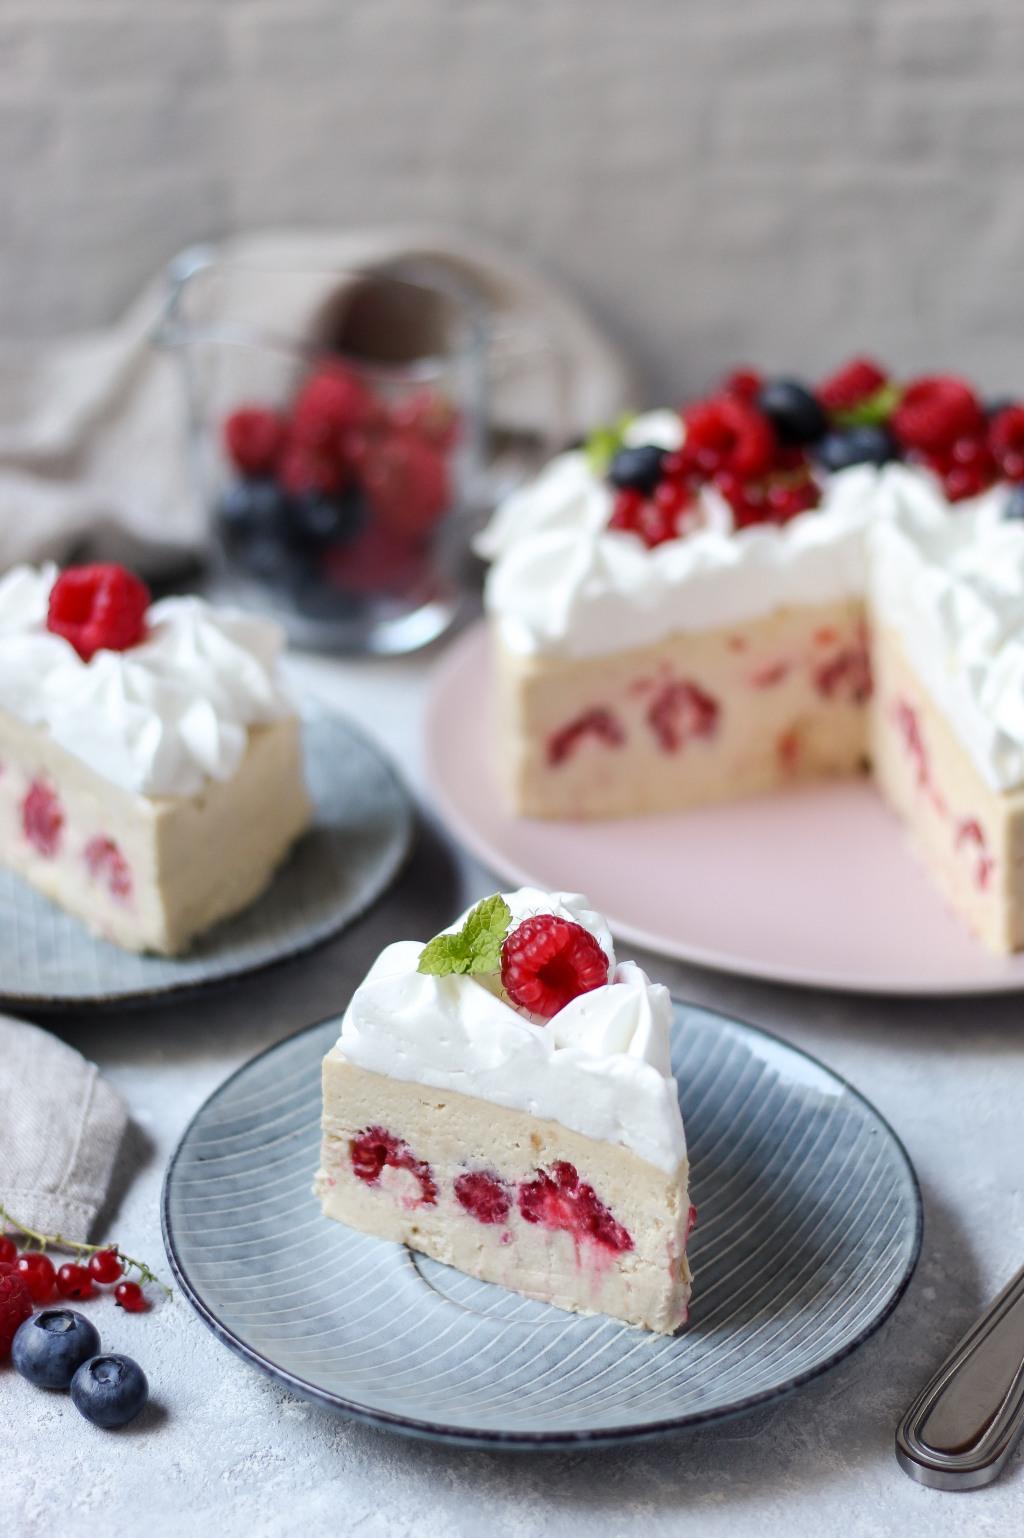 Brza torta sa malinama bez pečenja 6